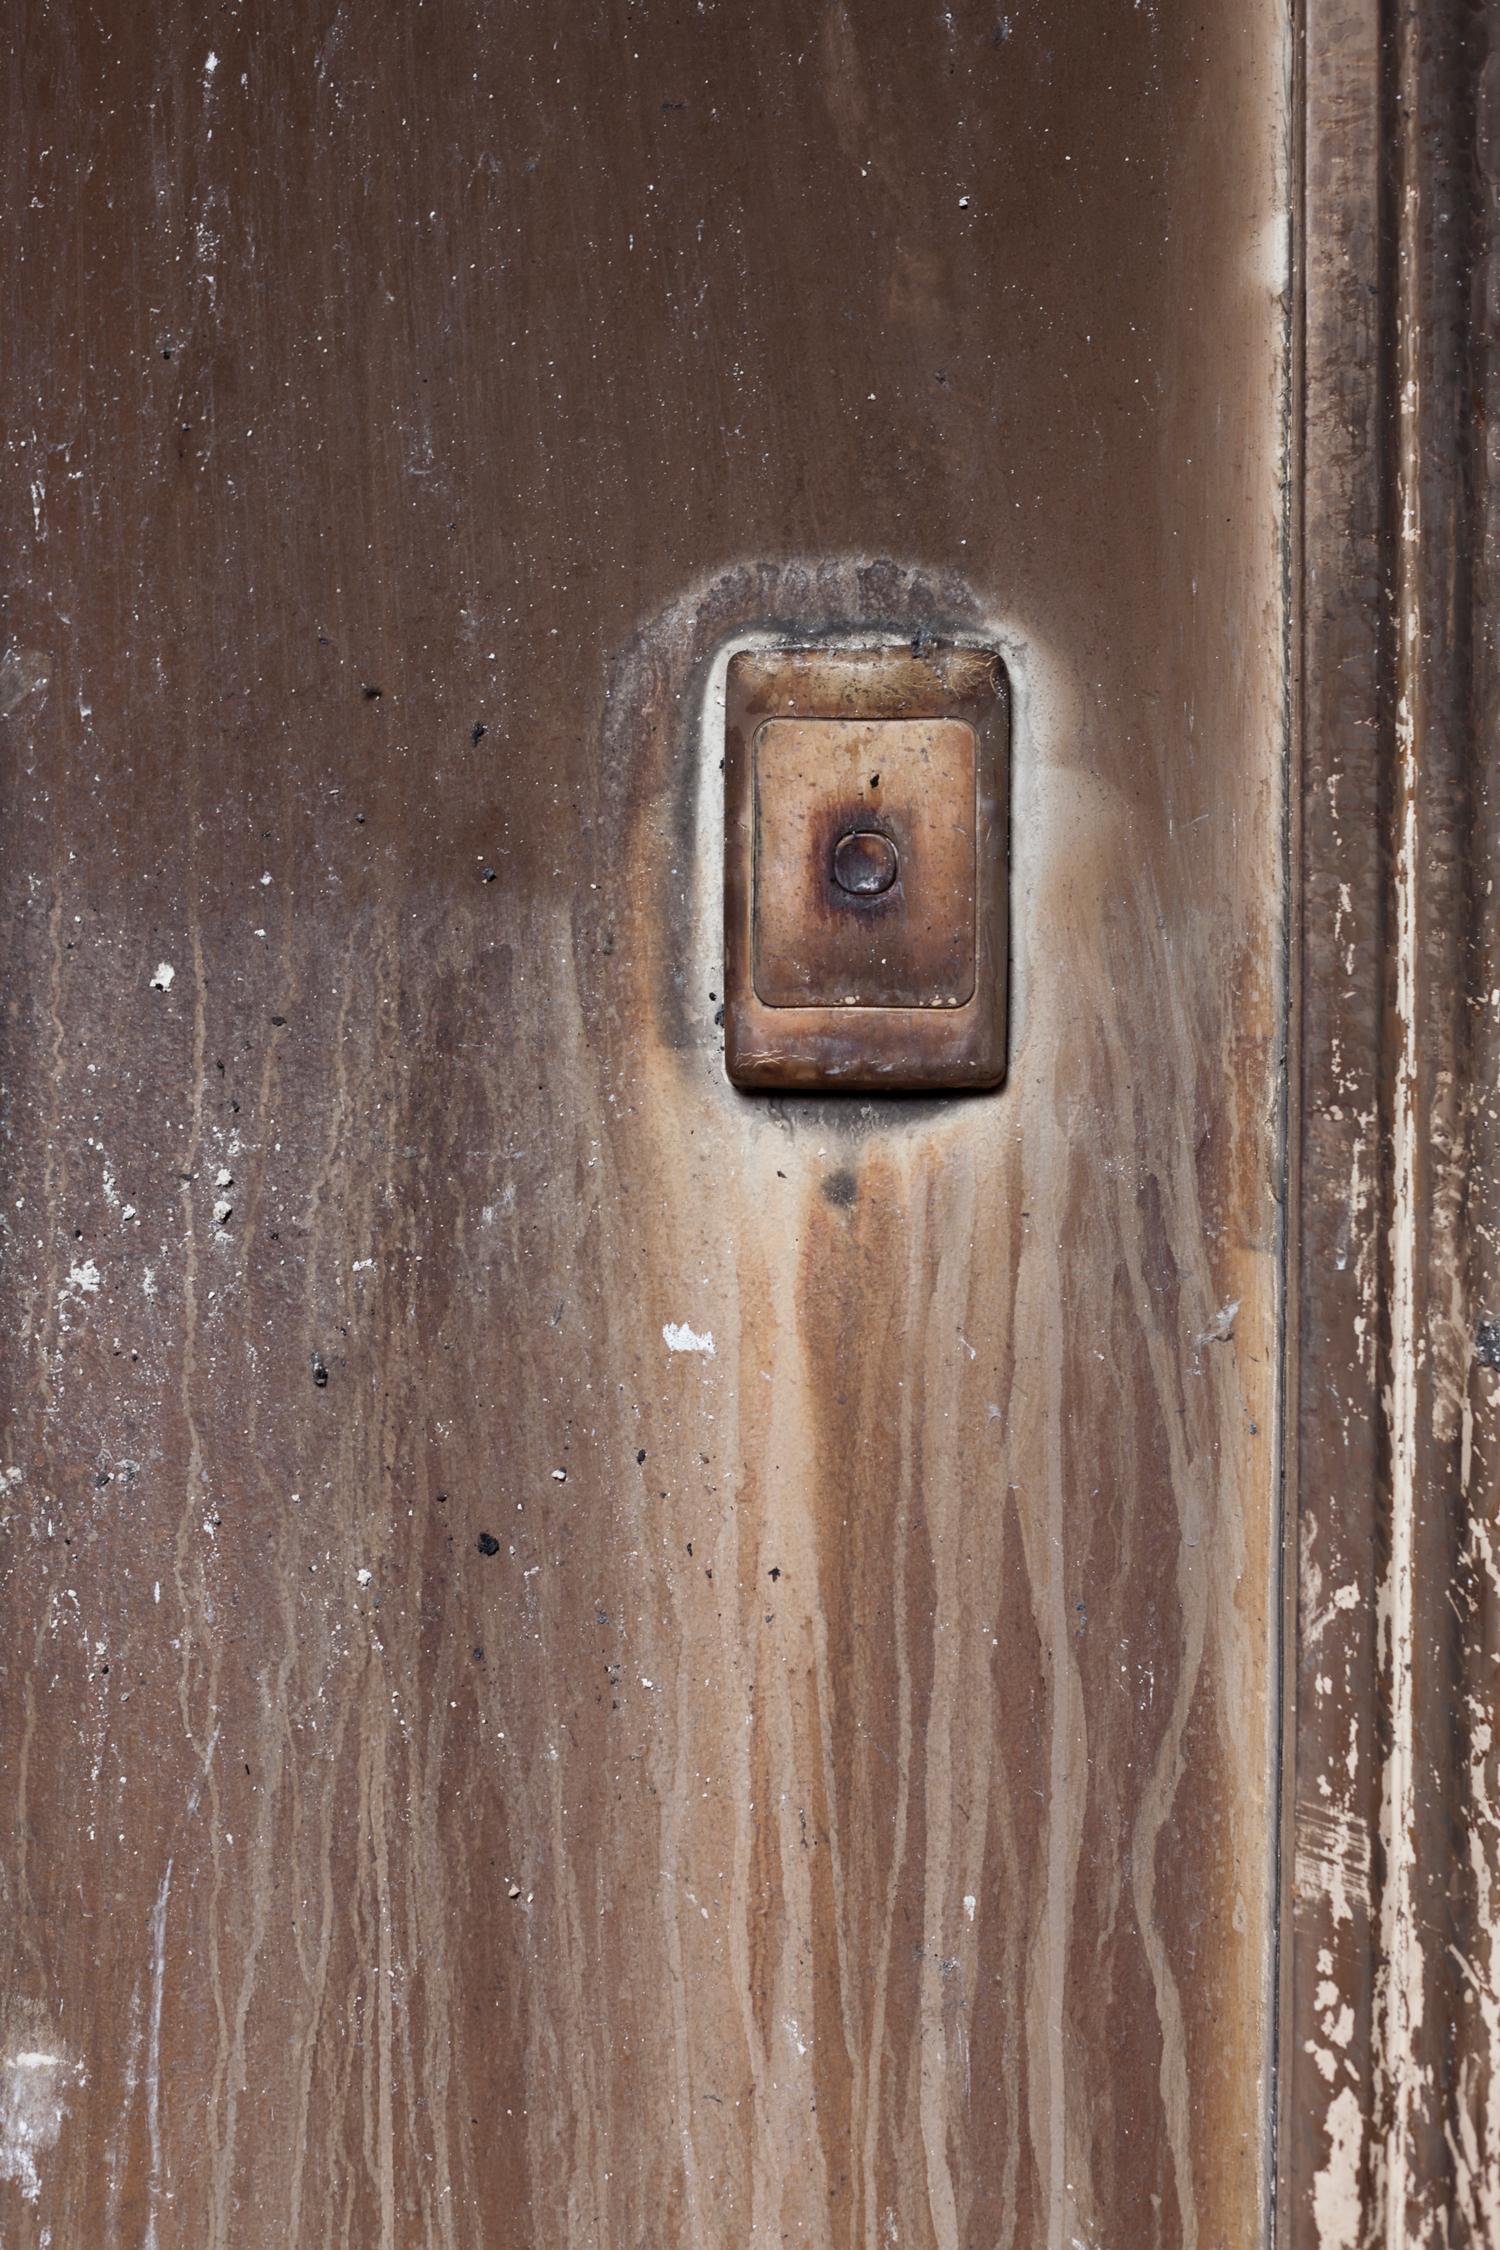 bri-hammond-the-hall-house-fire-light-switch.jpg